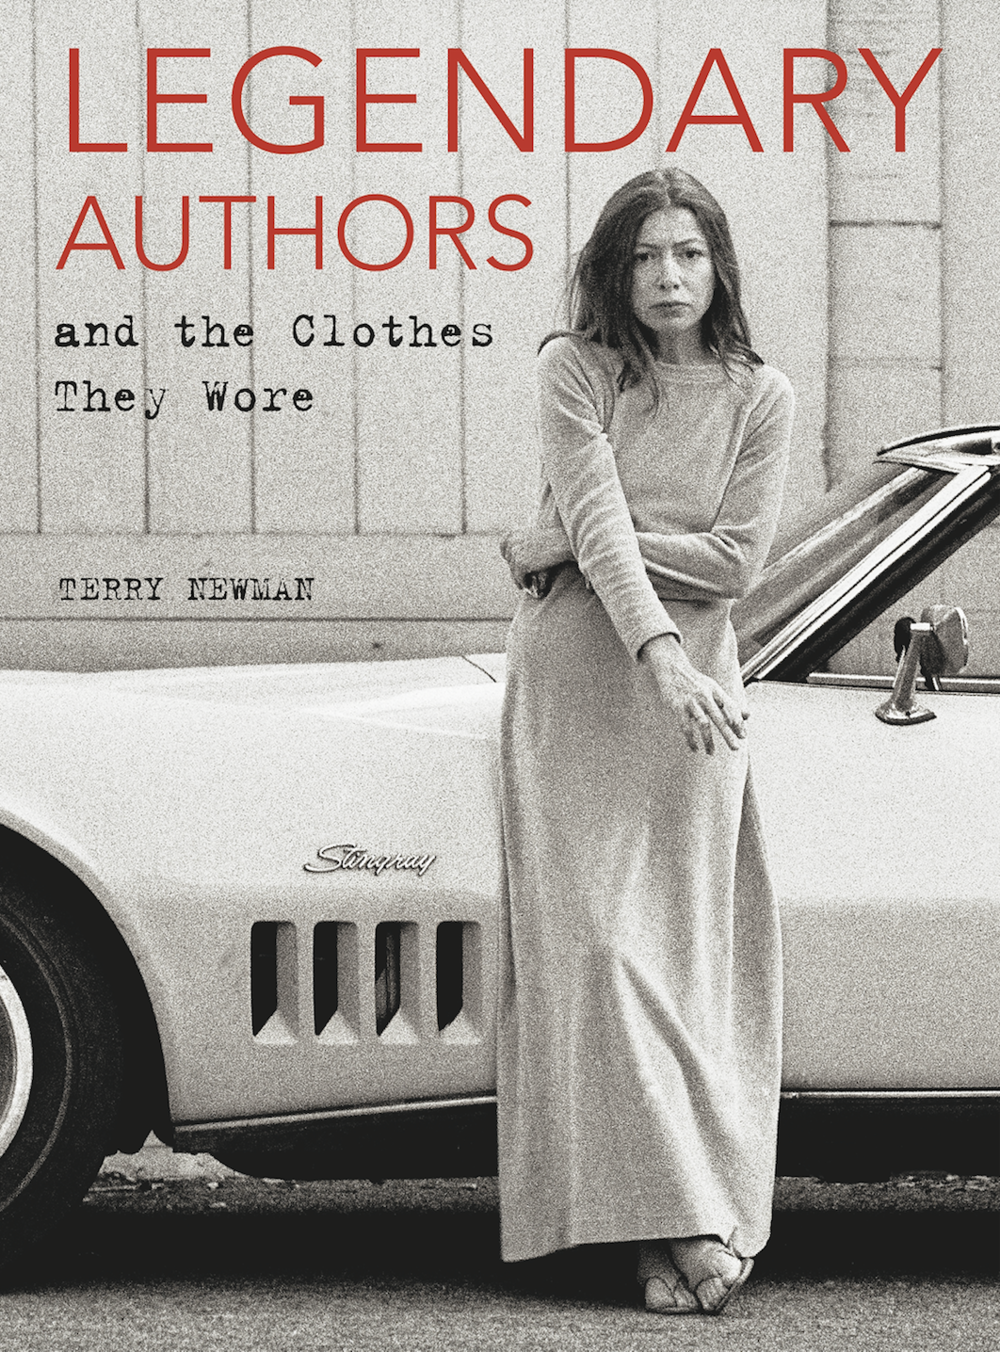 Book cover courtesy HarperCollins Publishers